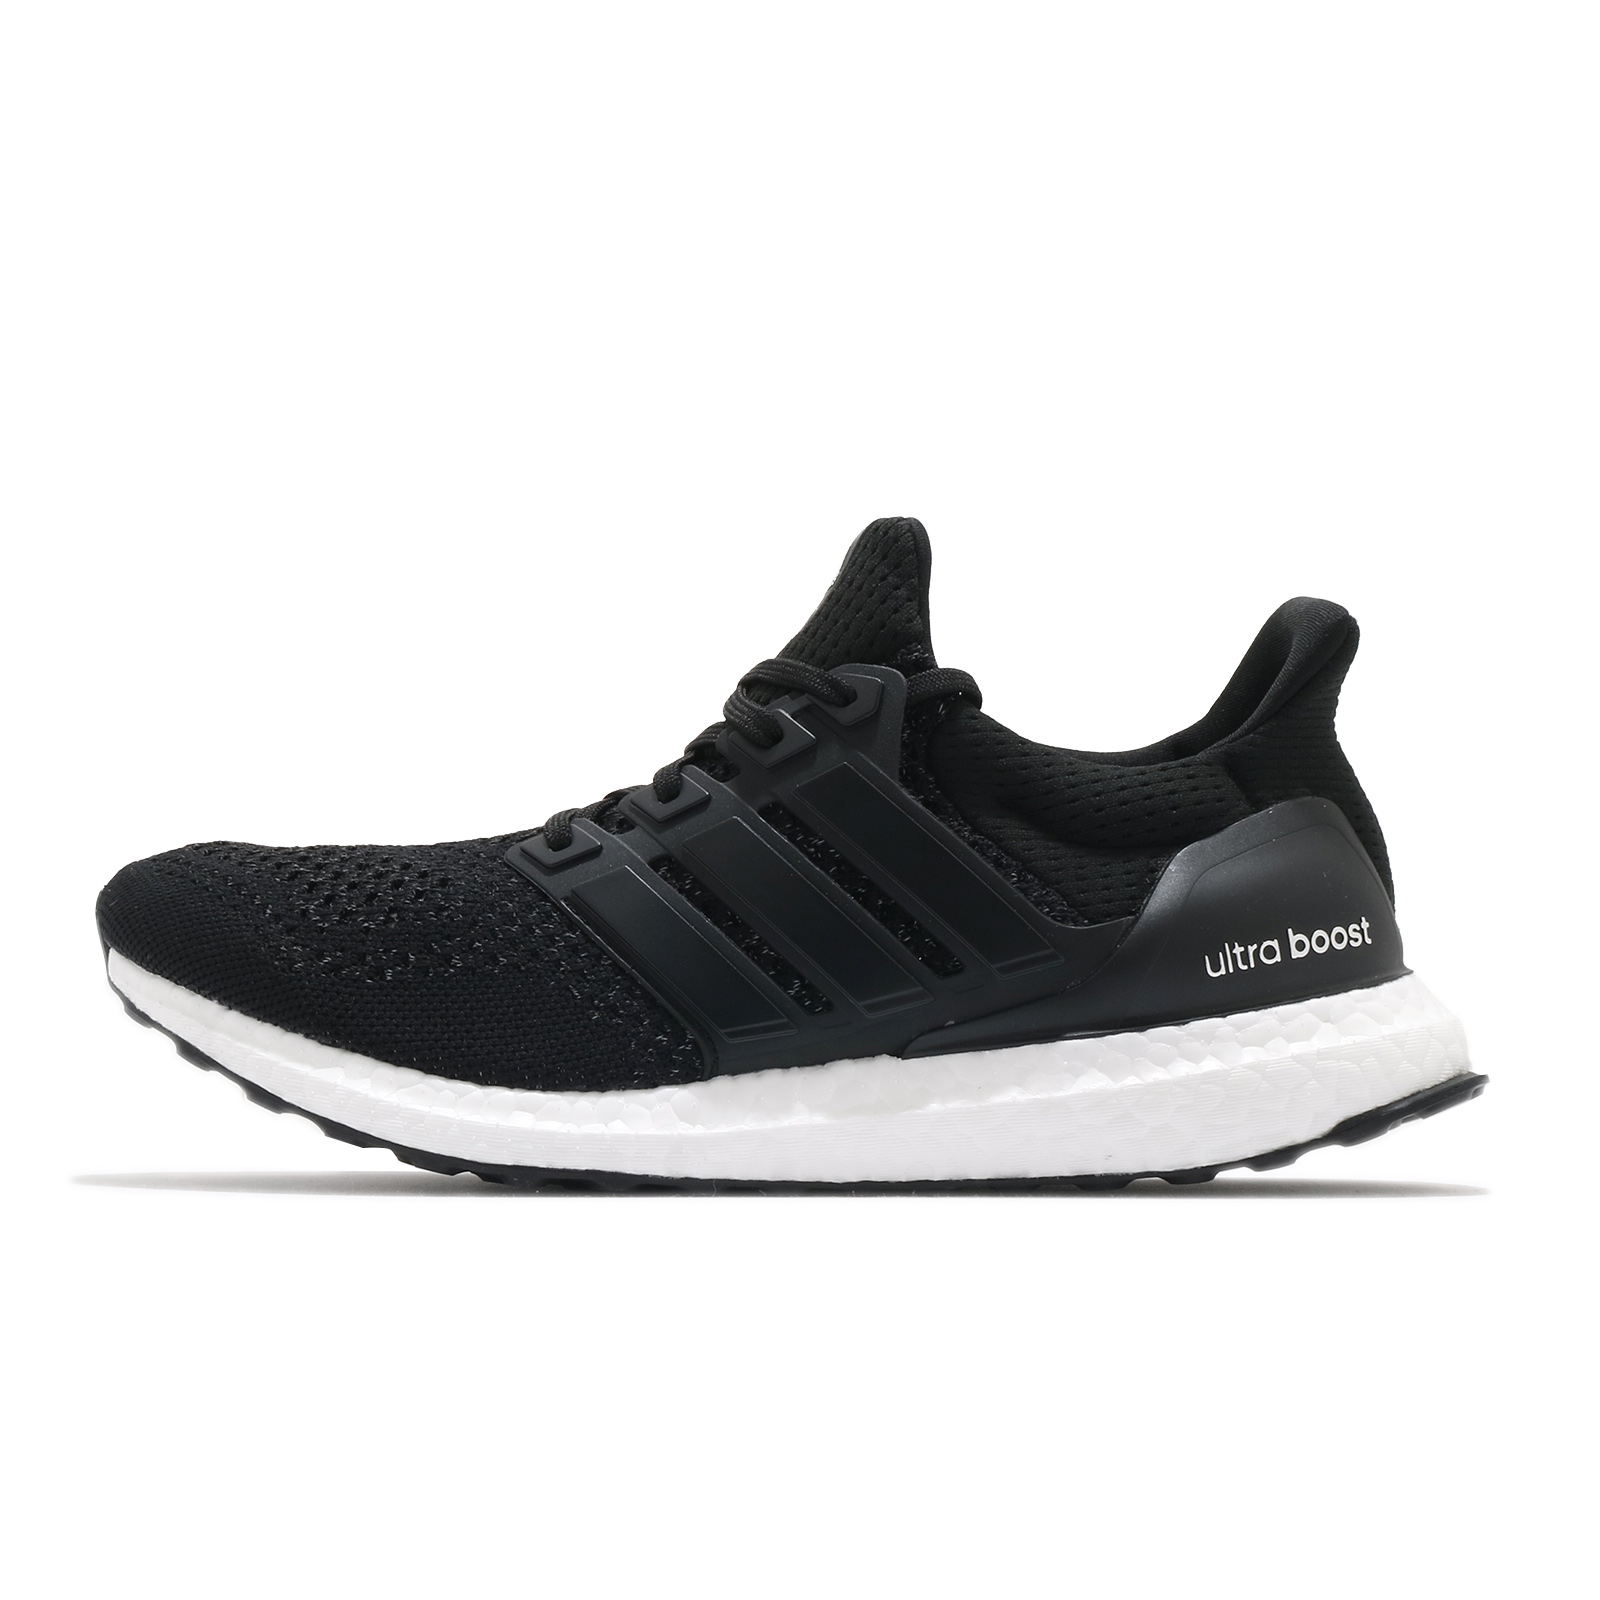 adidas 慢跑鞋 UltraBoost LTD 黑 白 男女鞋 反光 Boost 愛迪達 【ACS】 AQ5561